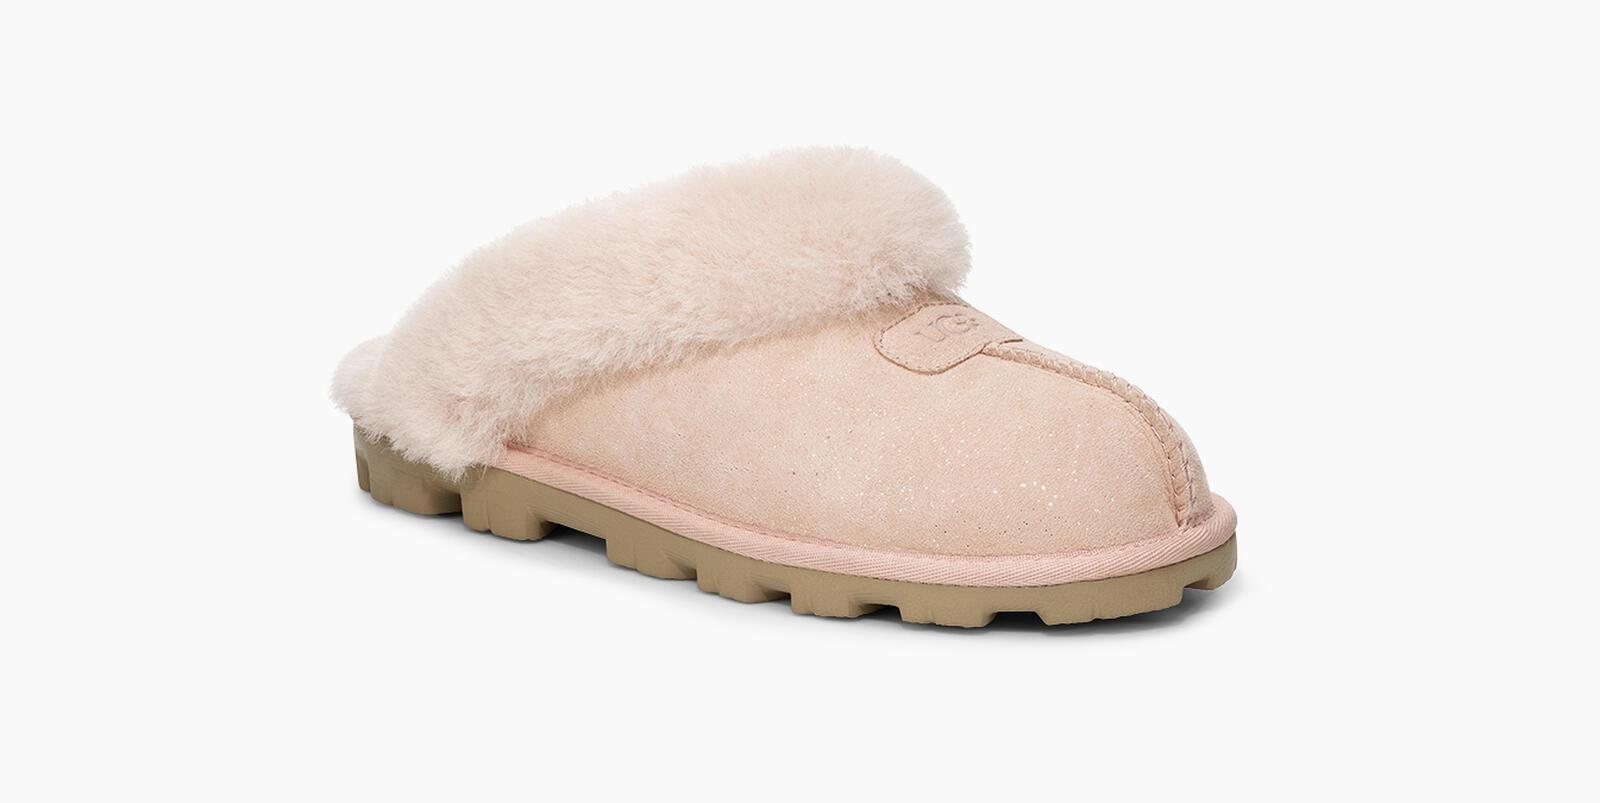 Coquette Twinkle Slipper